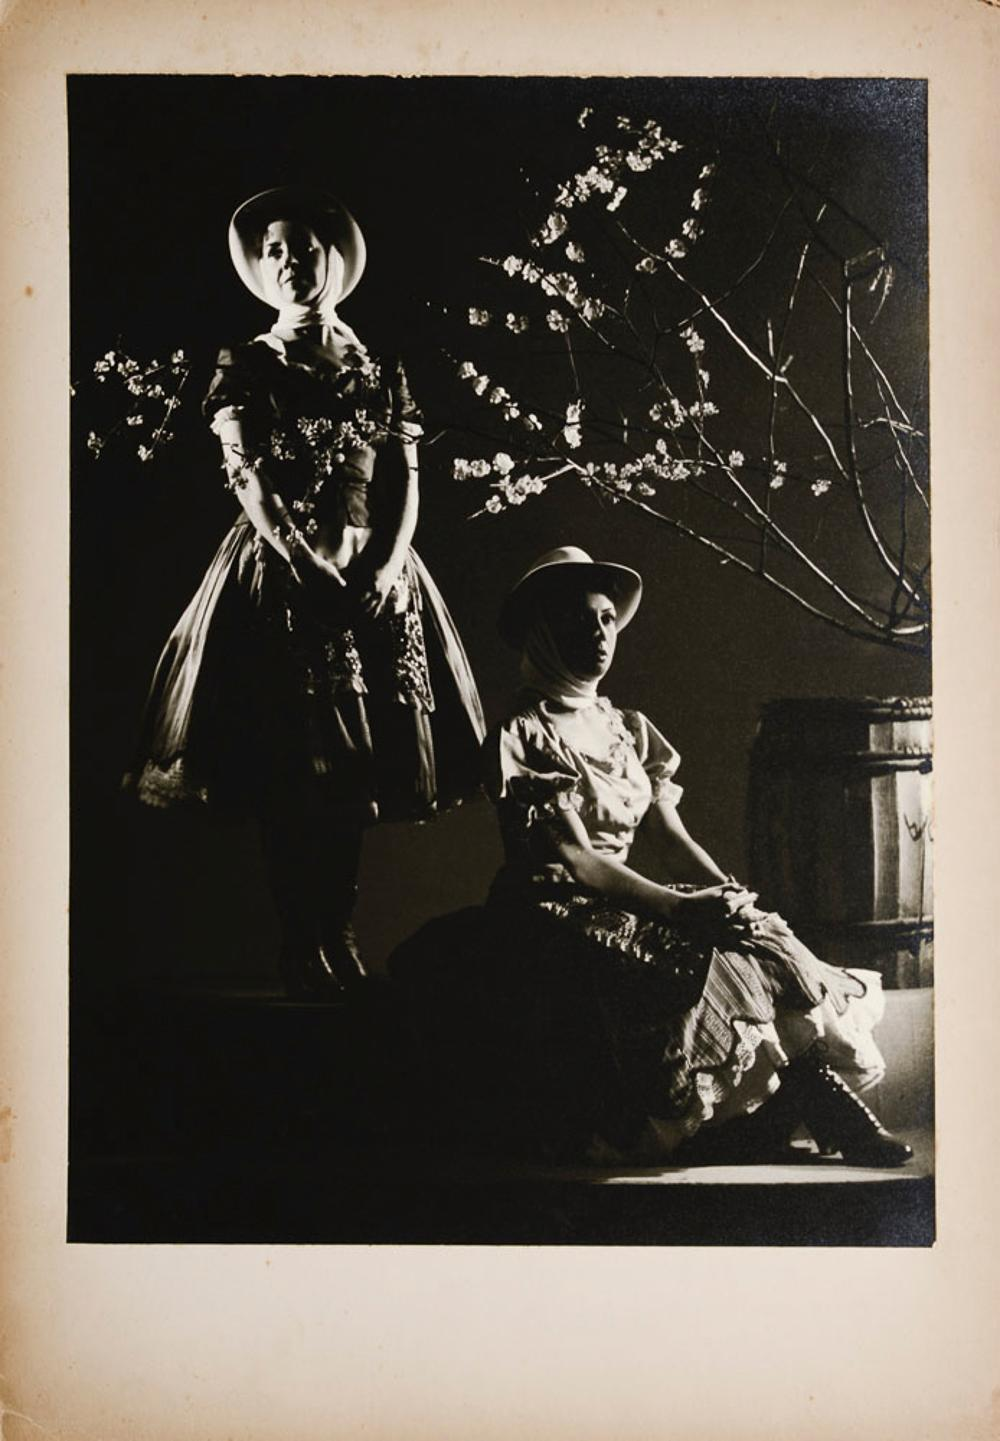 Black and white photograph, 50 x 35 cm.